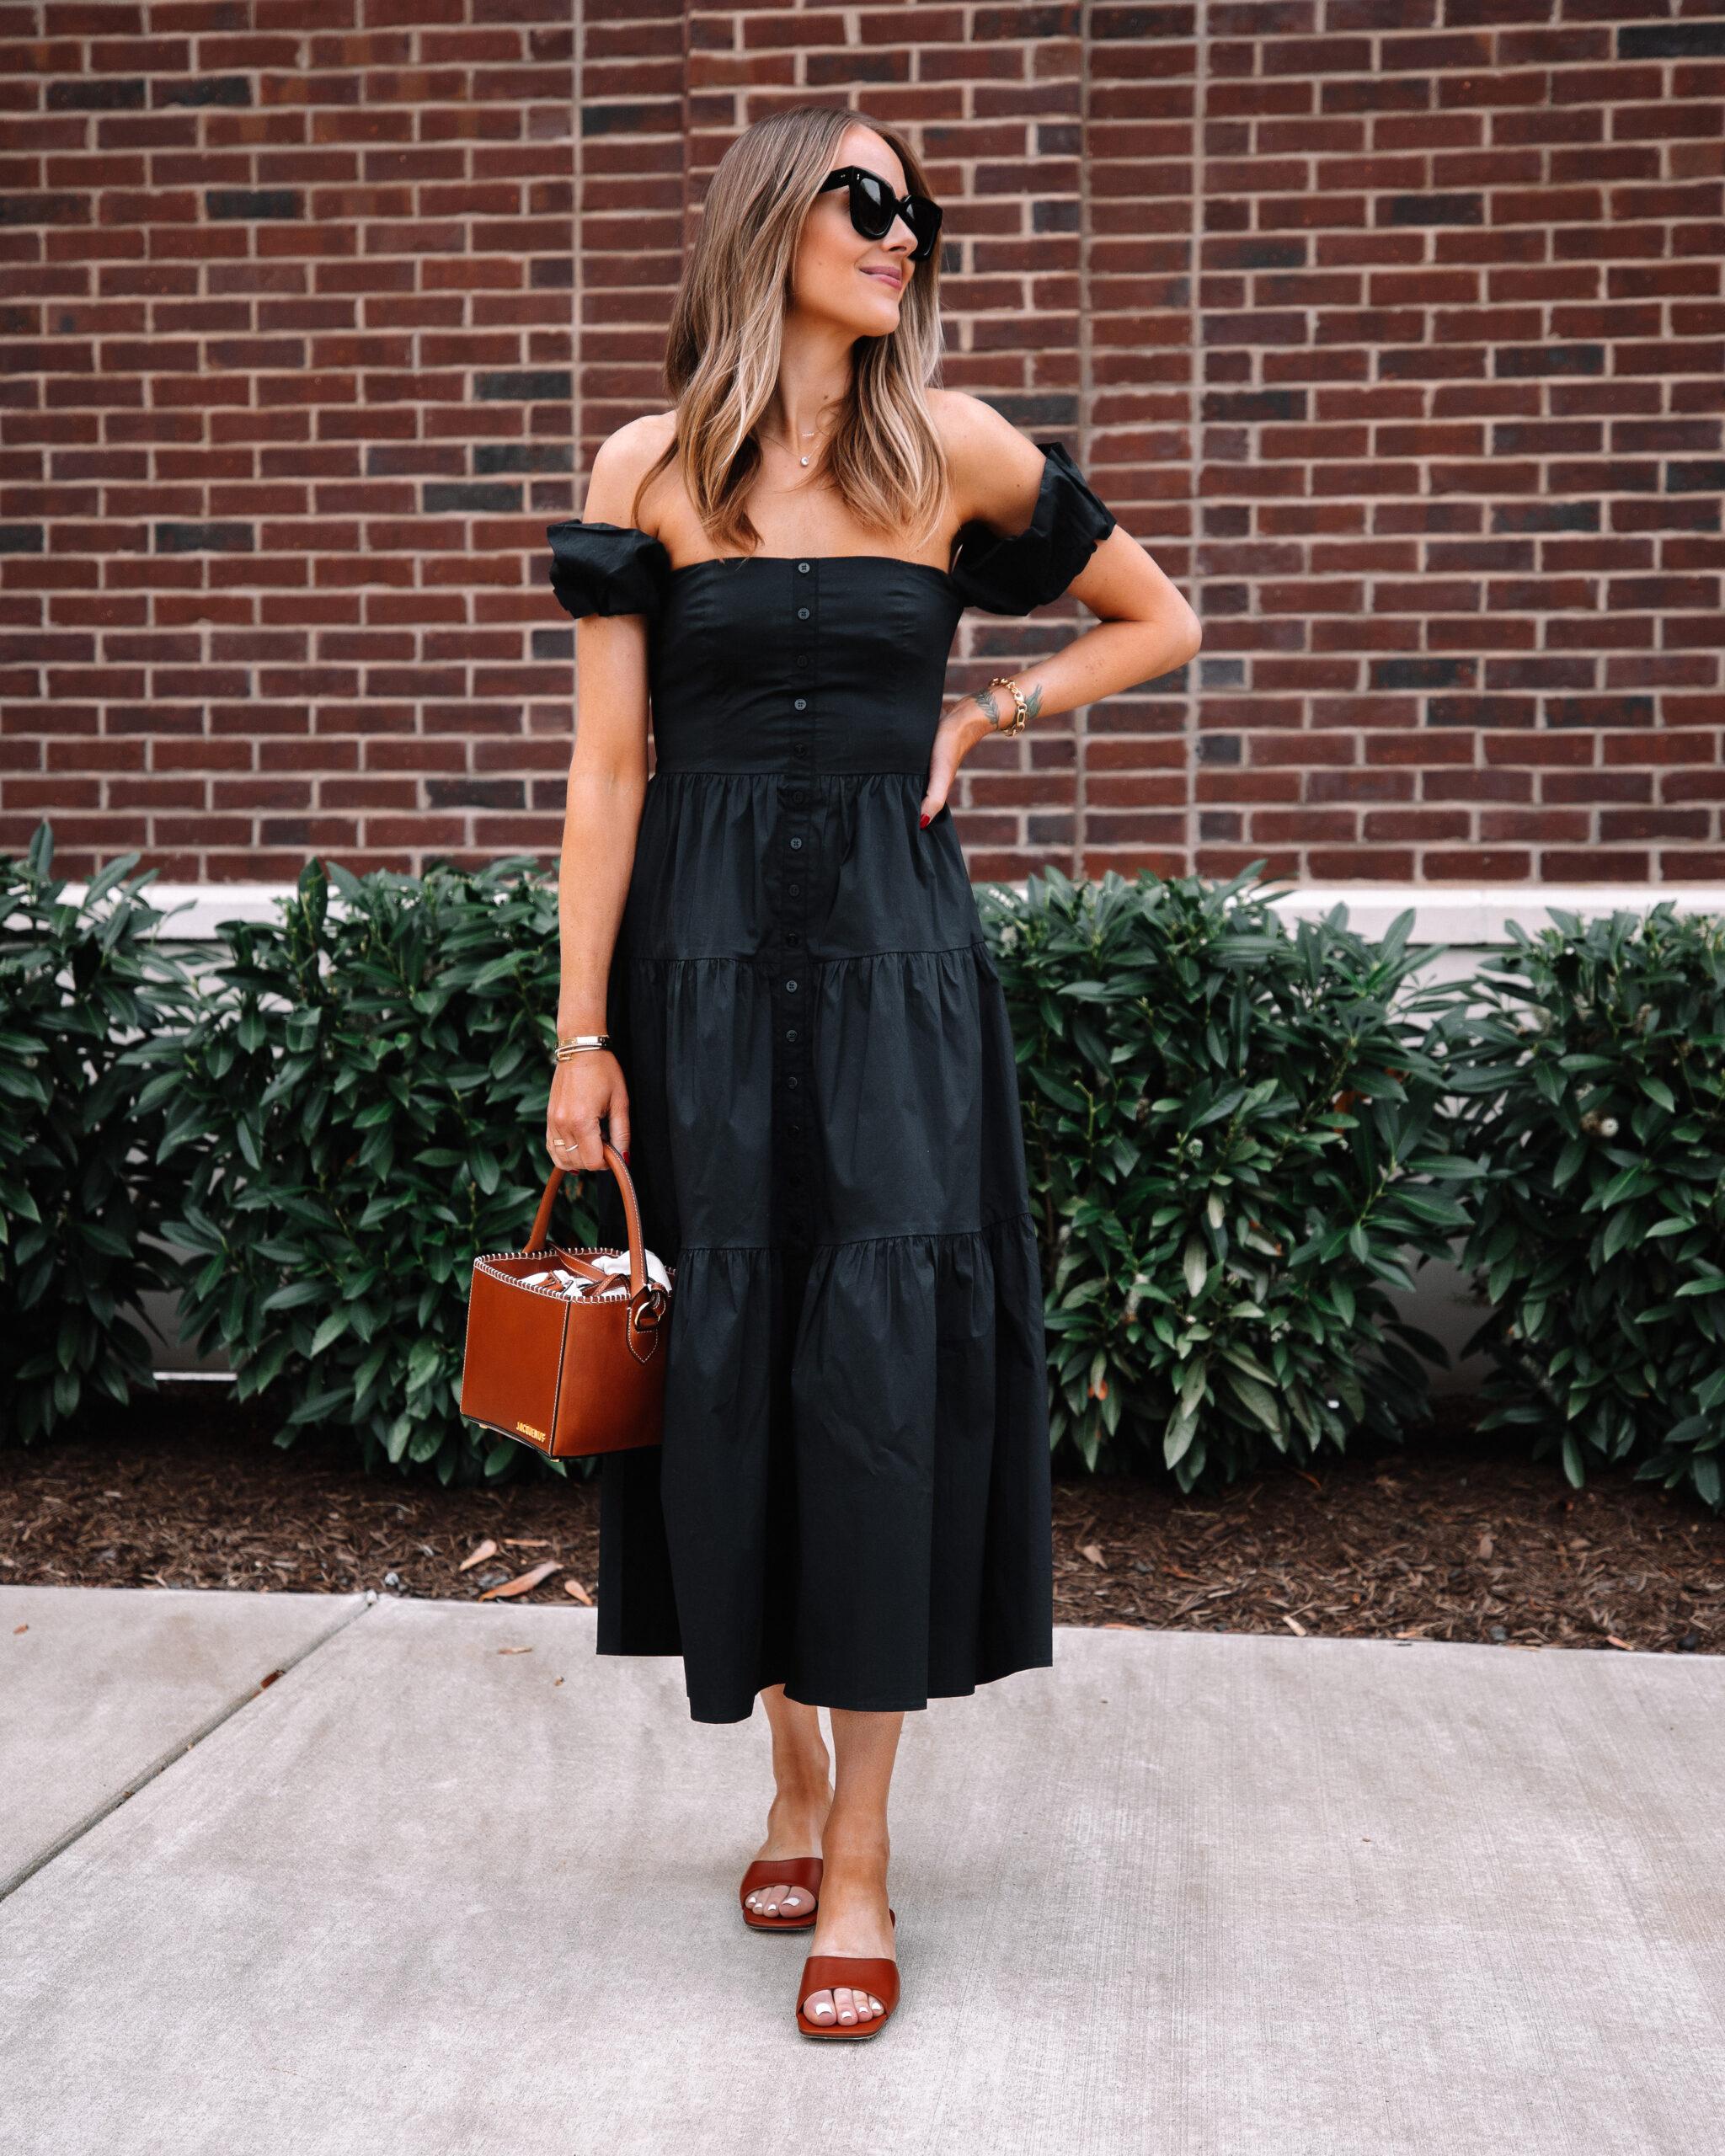 Fashion Jackson Wearing Shopbop Off the Shoulder Black Midi Dress Tan Sandals Tan Handbag